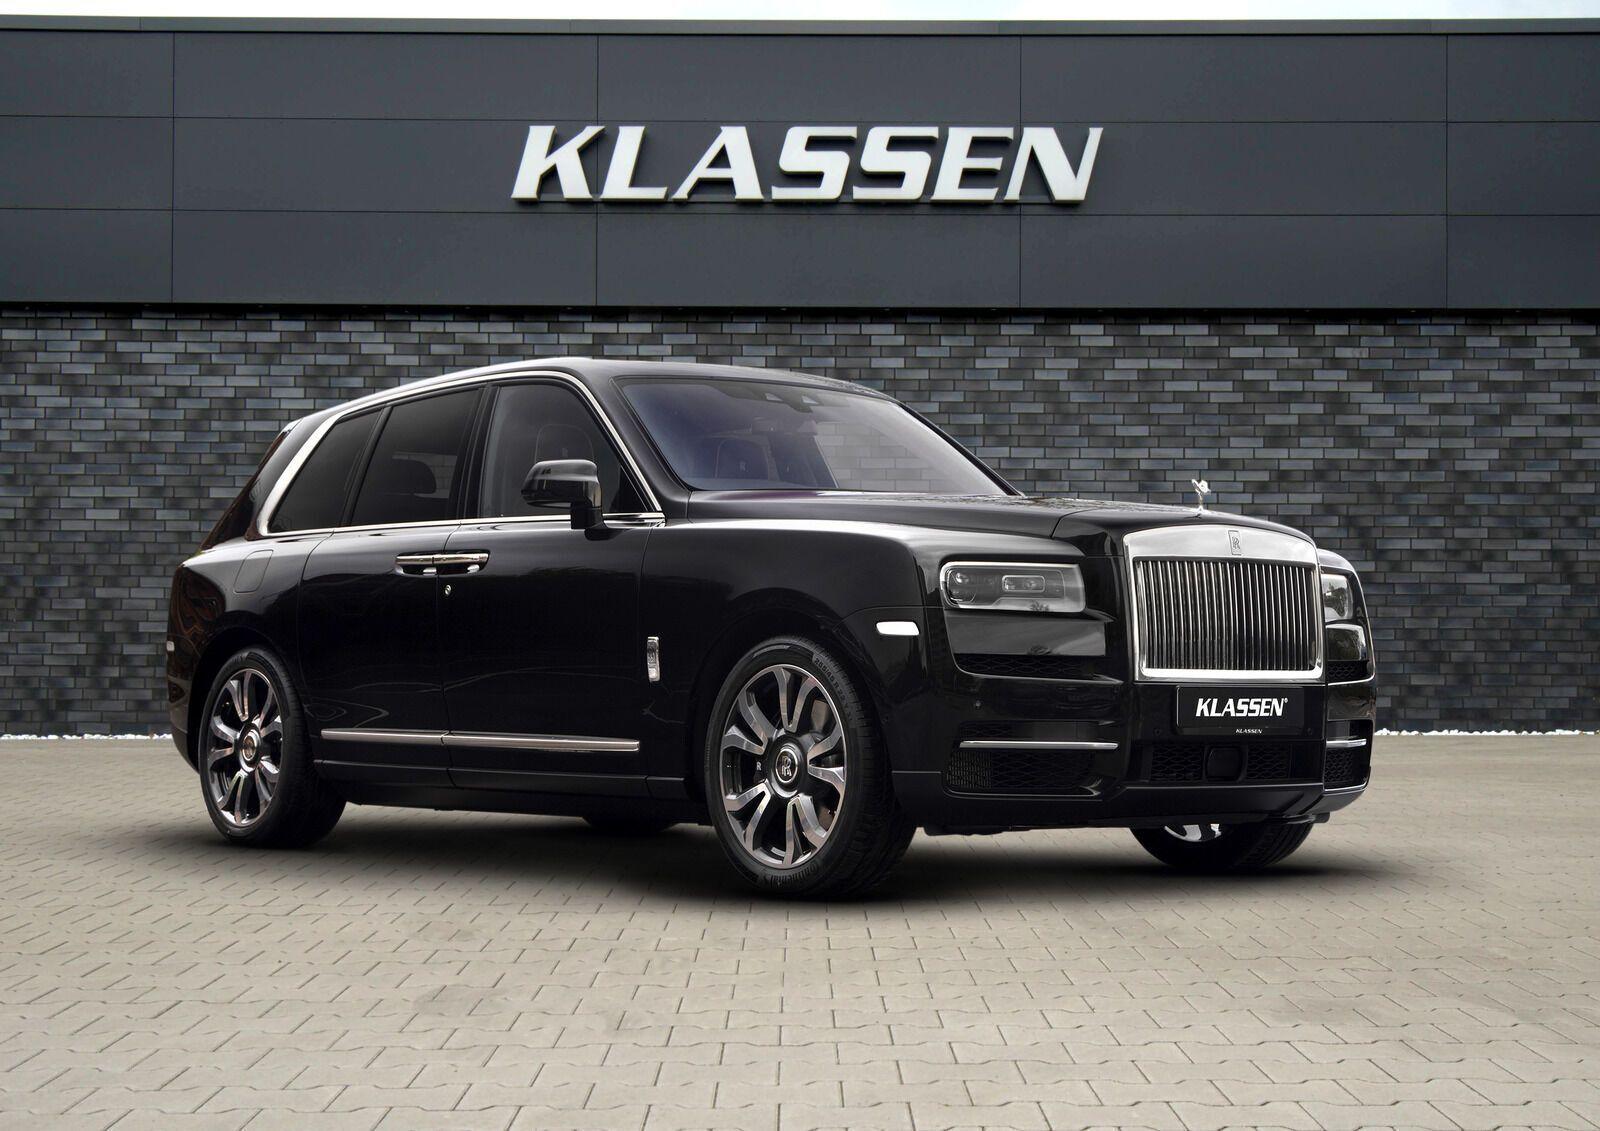 Klassen применяет для Rolls-Royce Cullinan броню уровня BR6 по стандарту CEN 1063